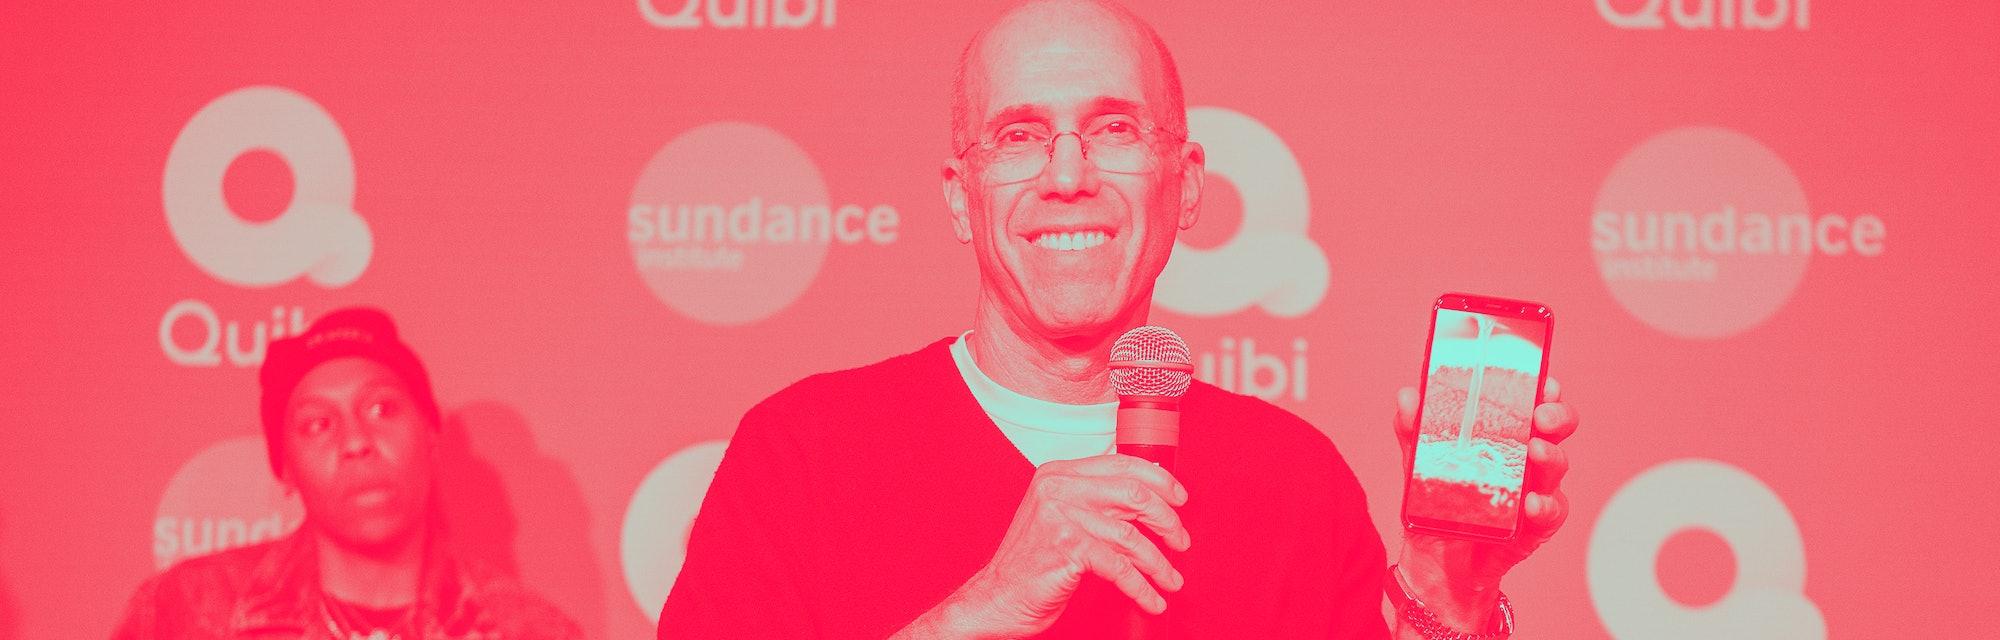 Jeffrey Katzenberg holding up a phone running Quibi.